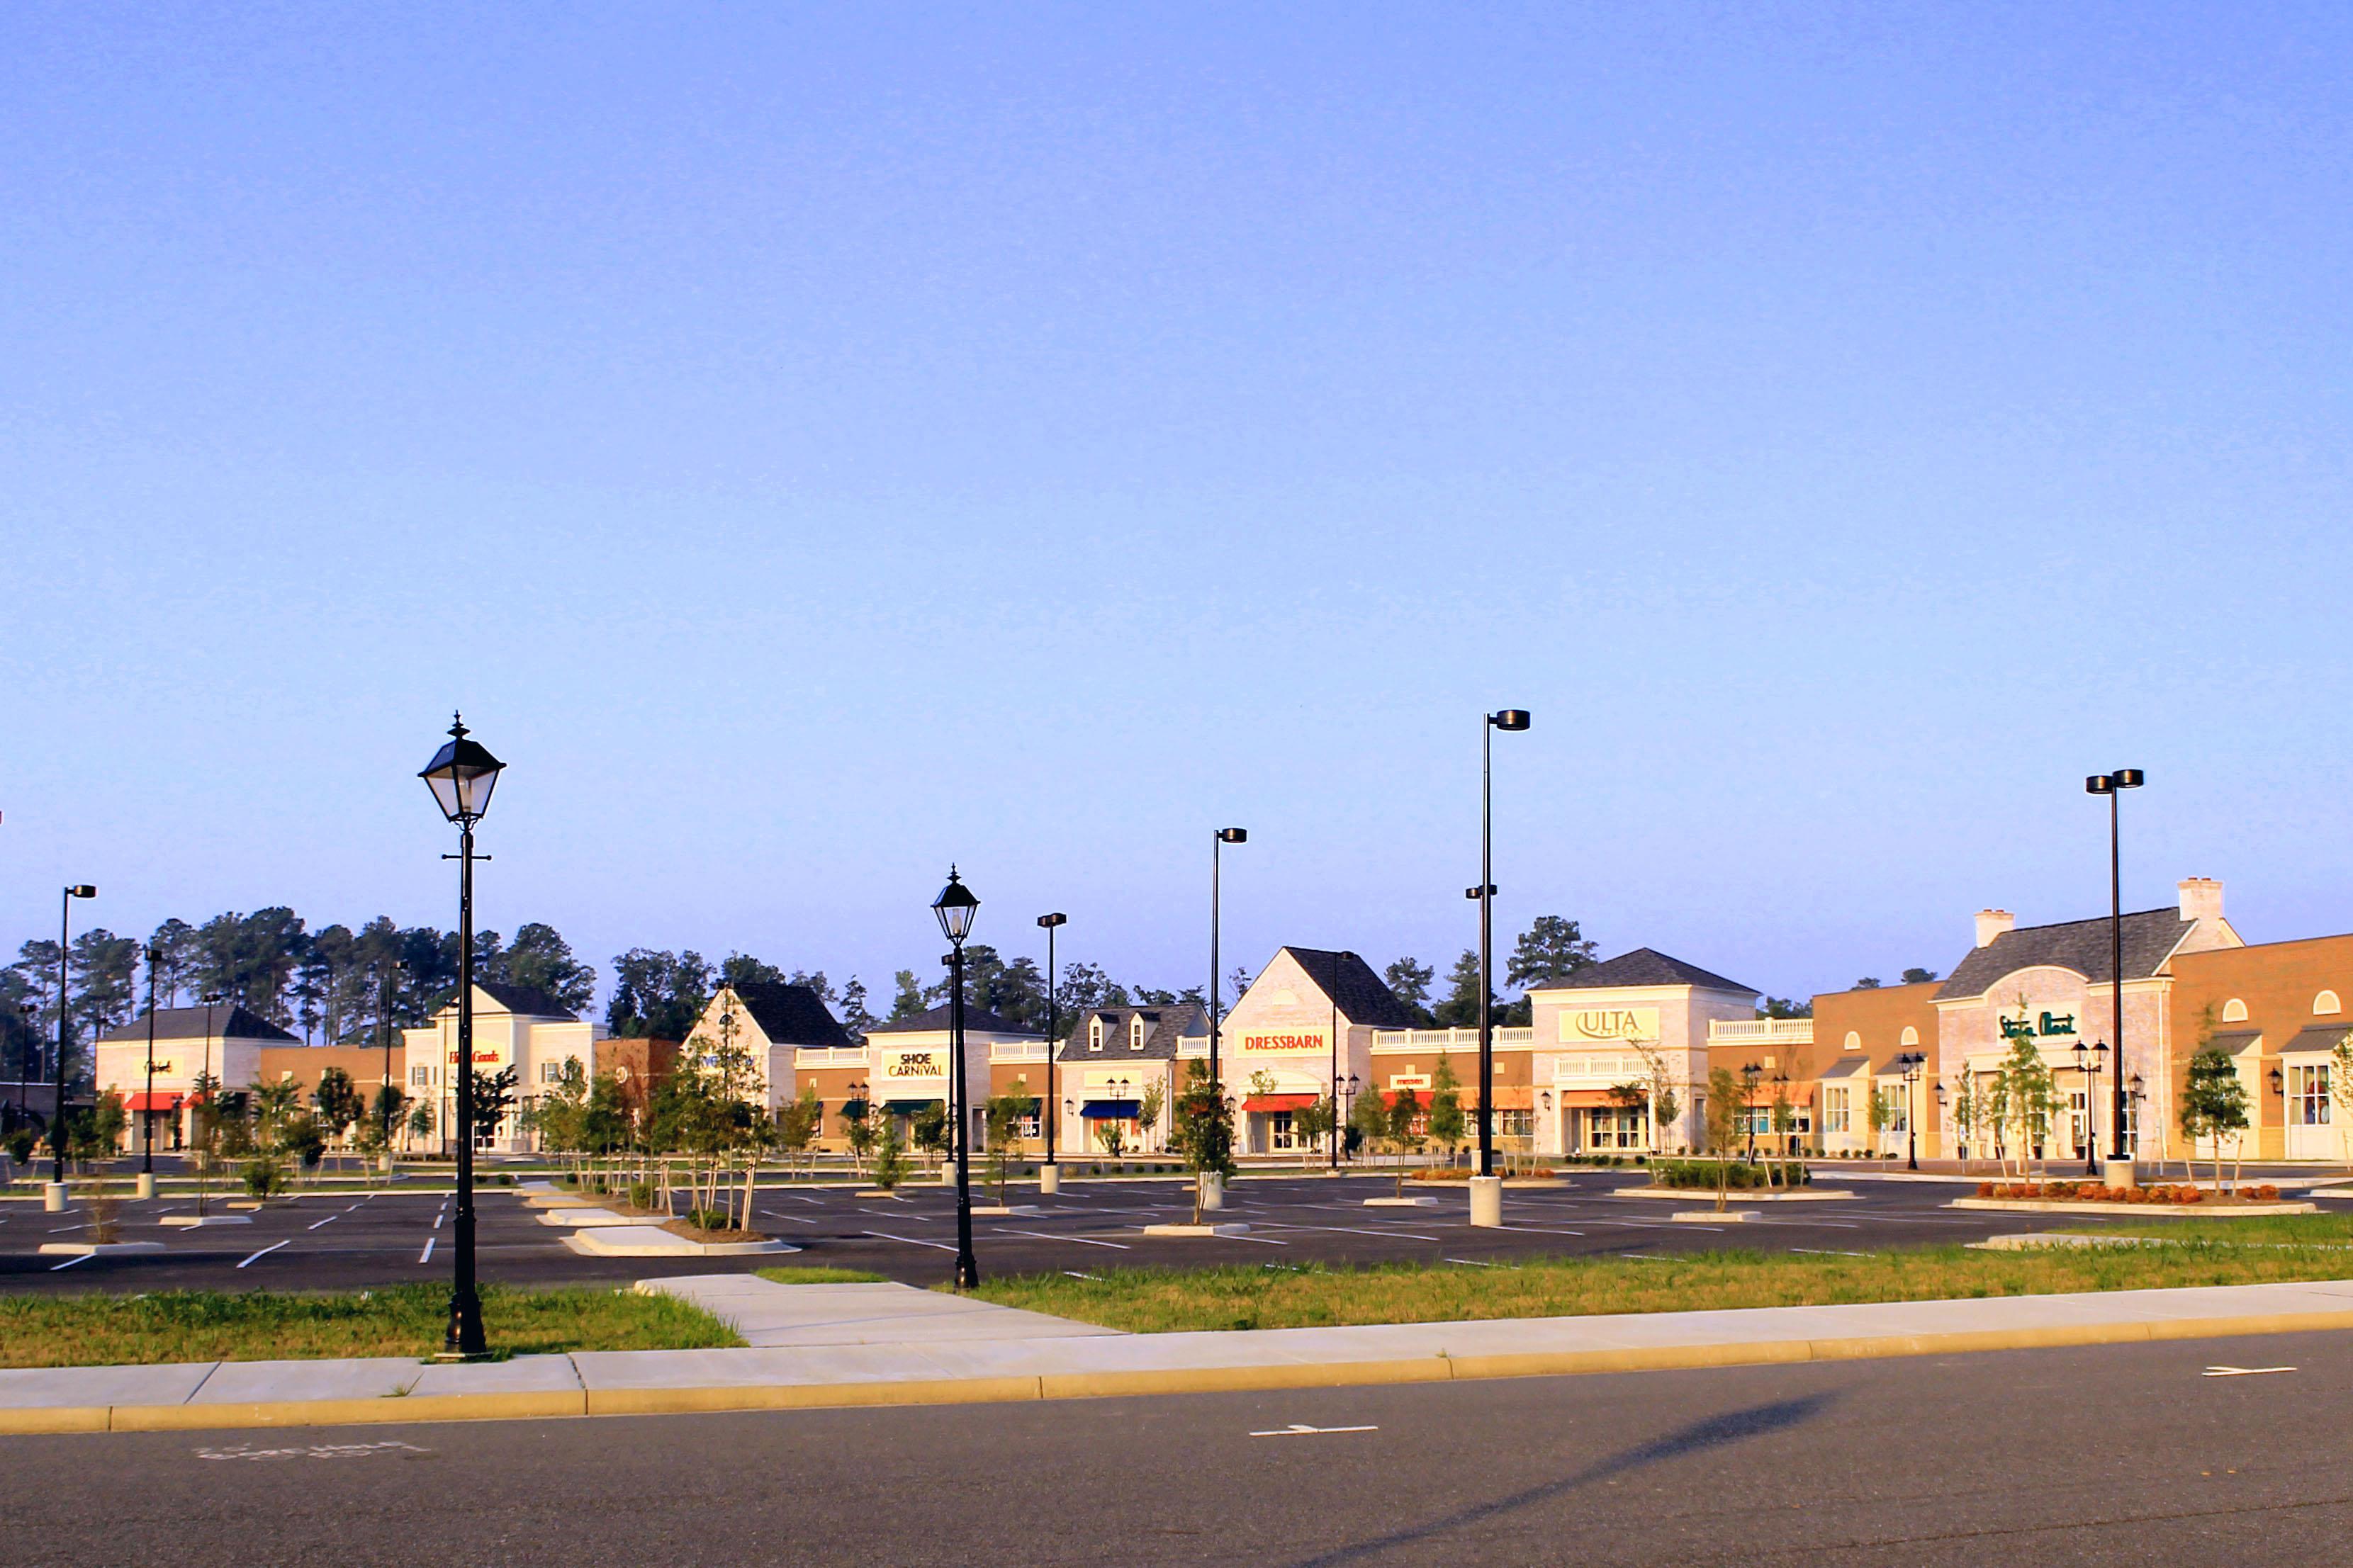 Settlers Market